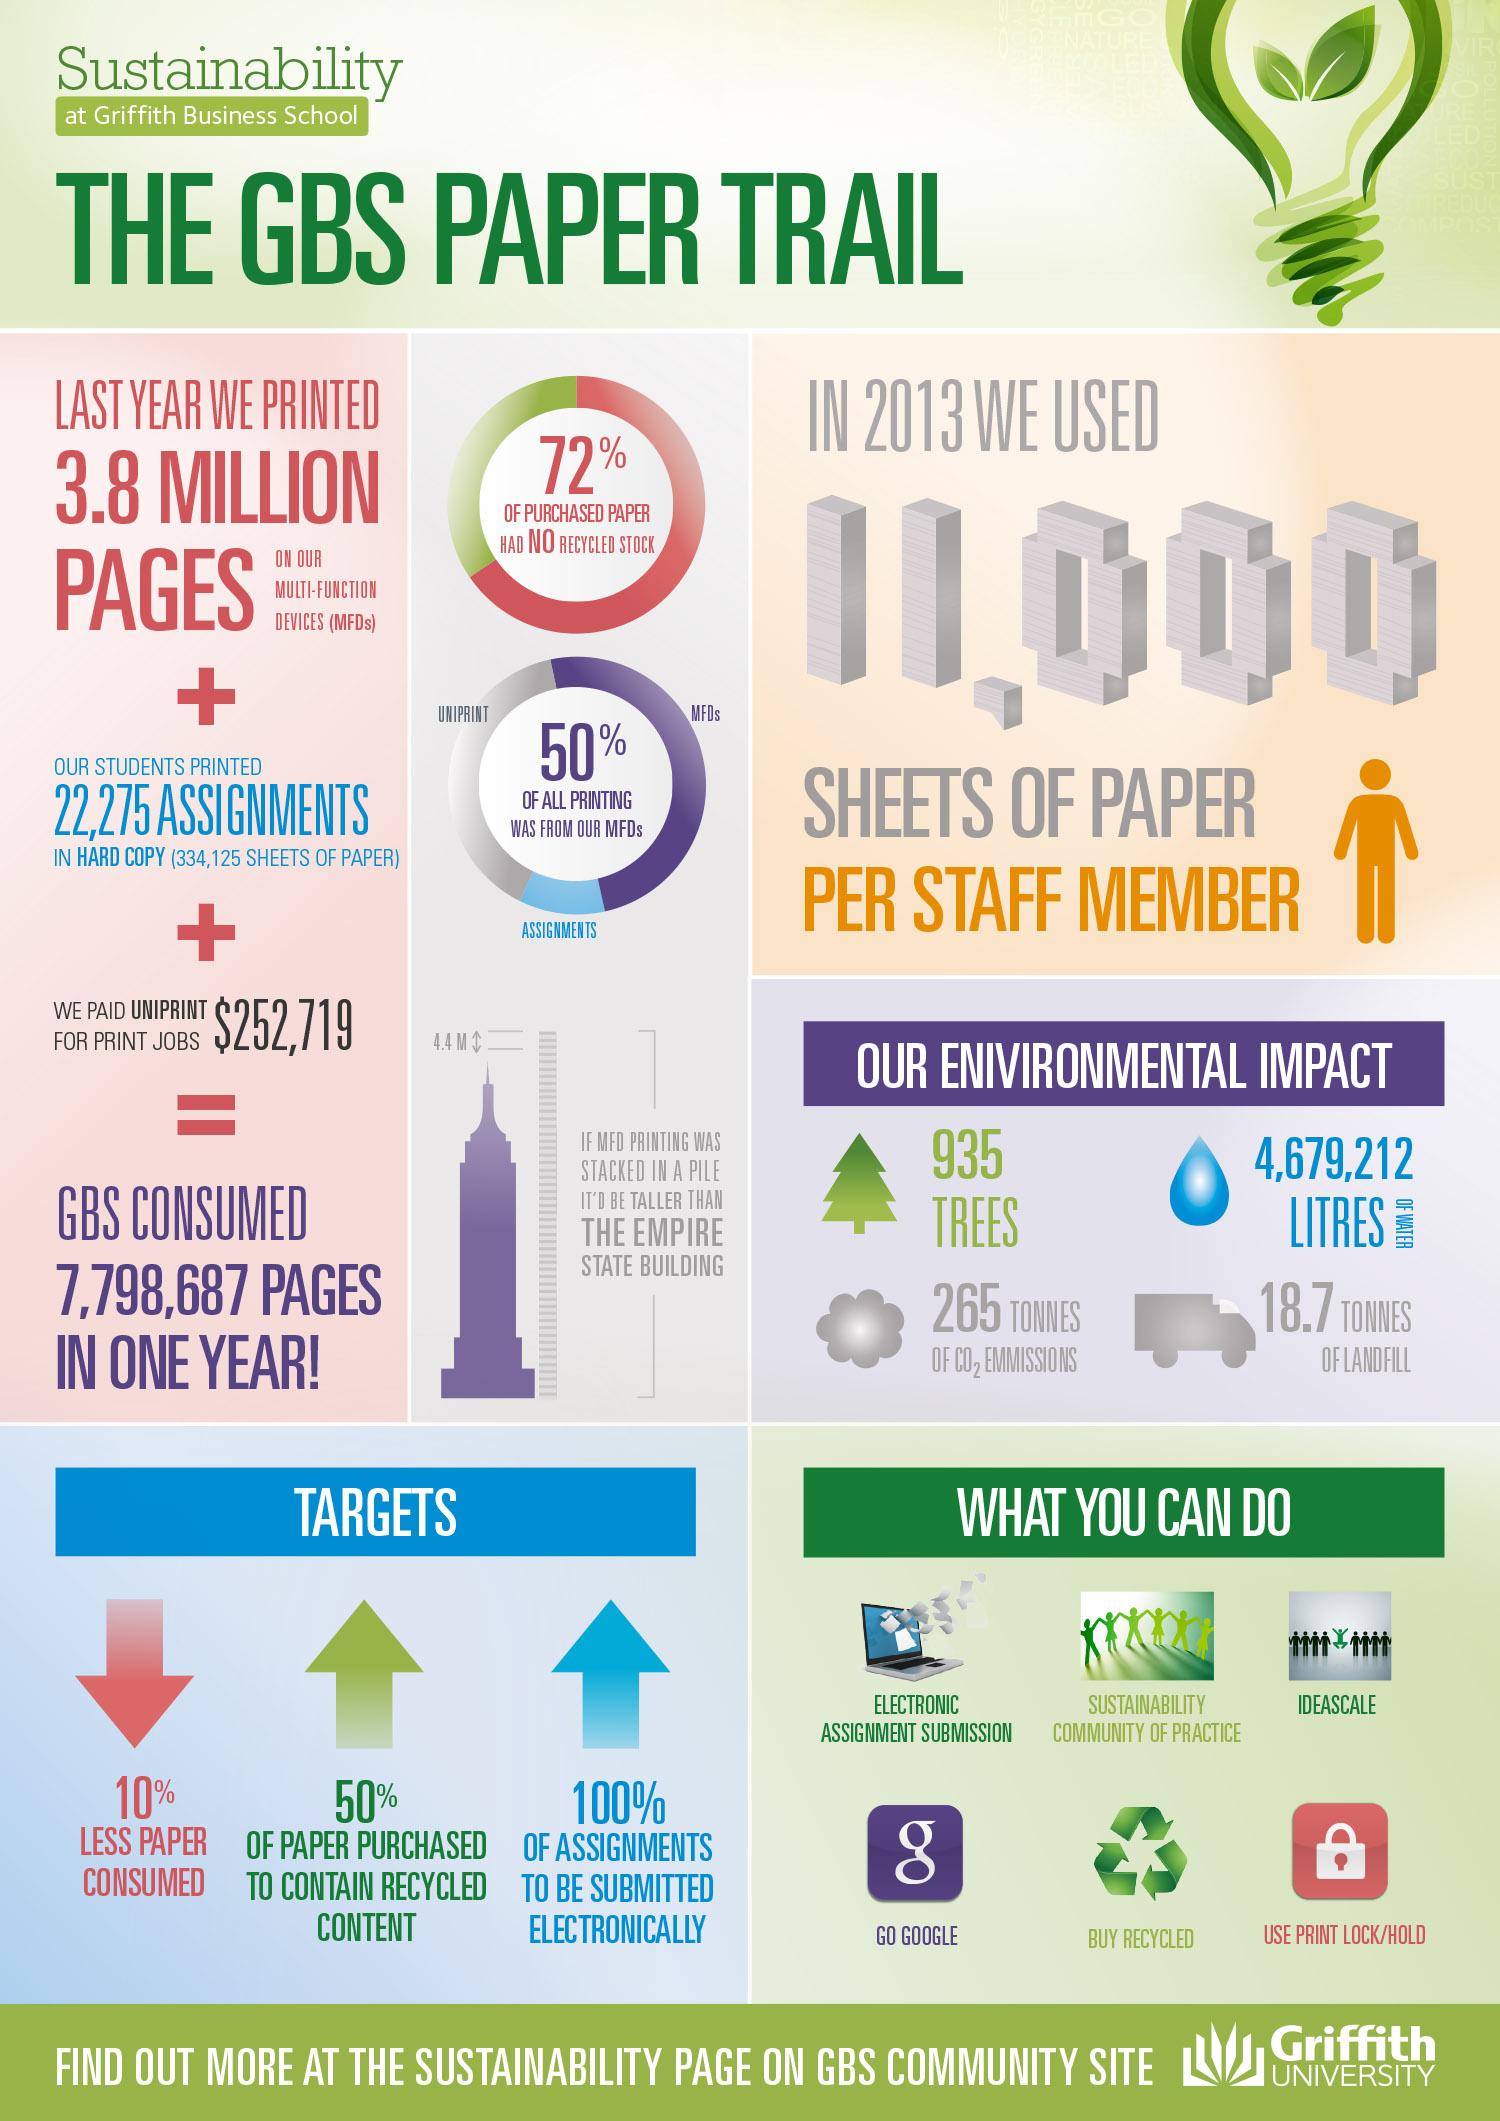 chris underwood graphic design web development project category infographic print design